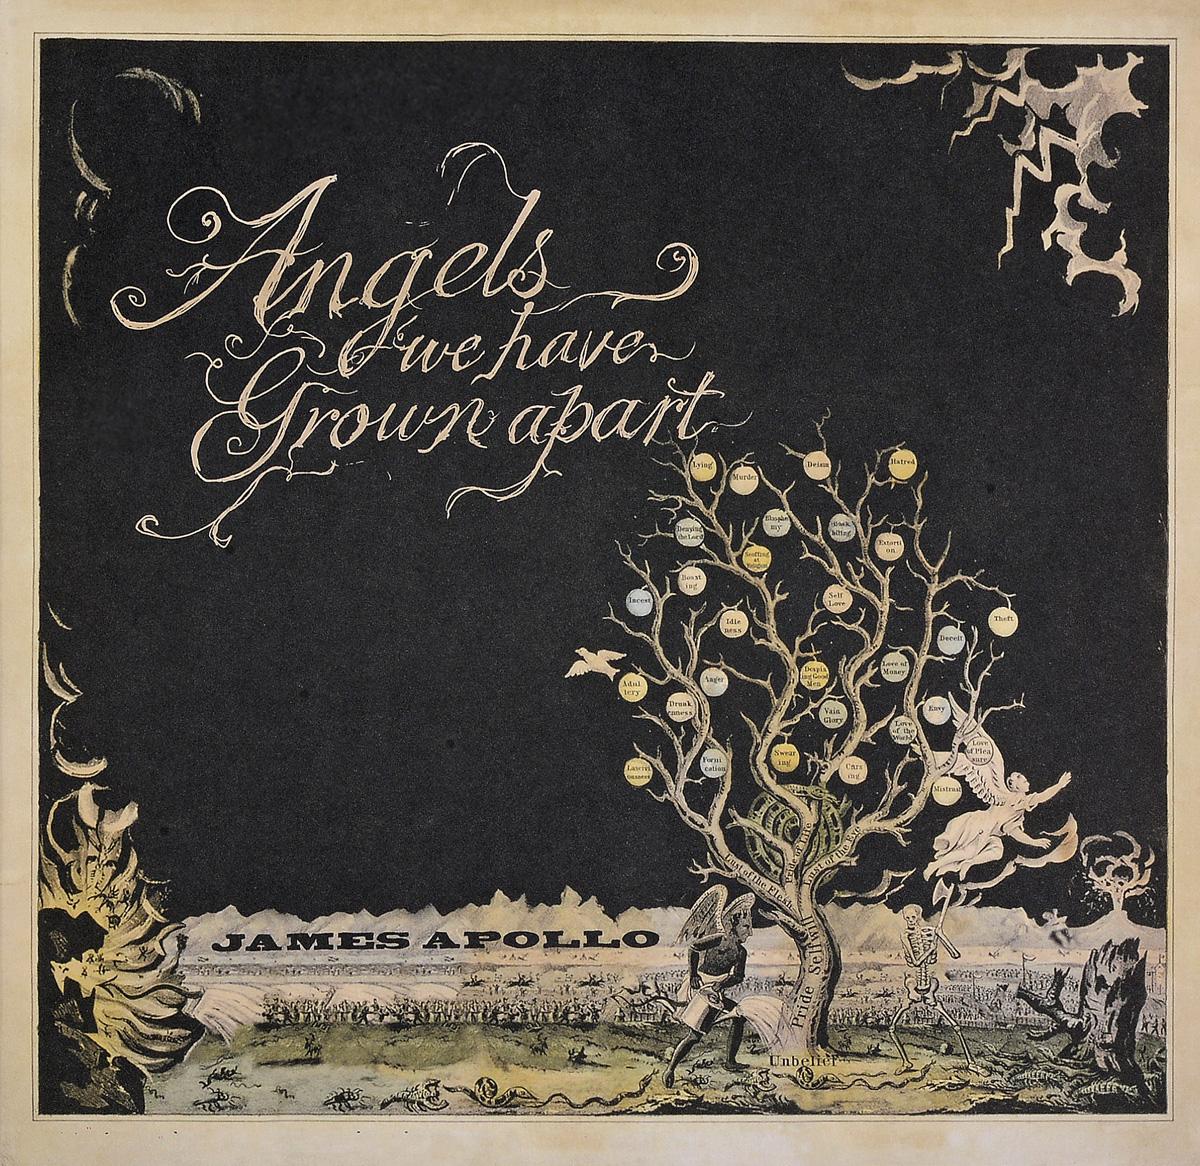 James Apollo. Angels We Have Grown Apart (LP)